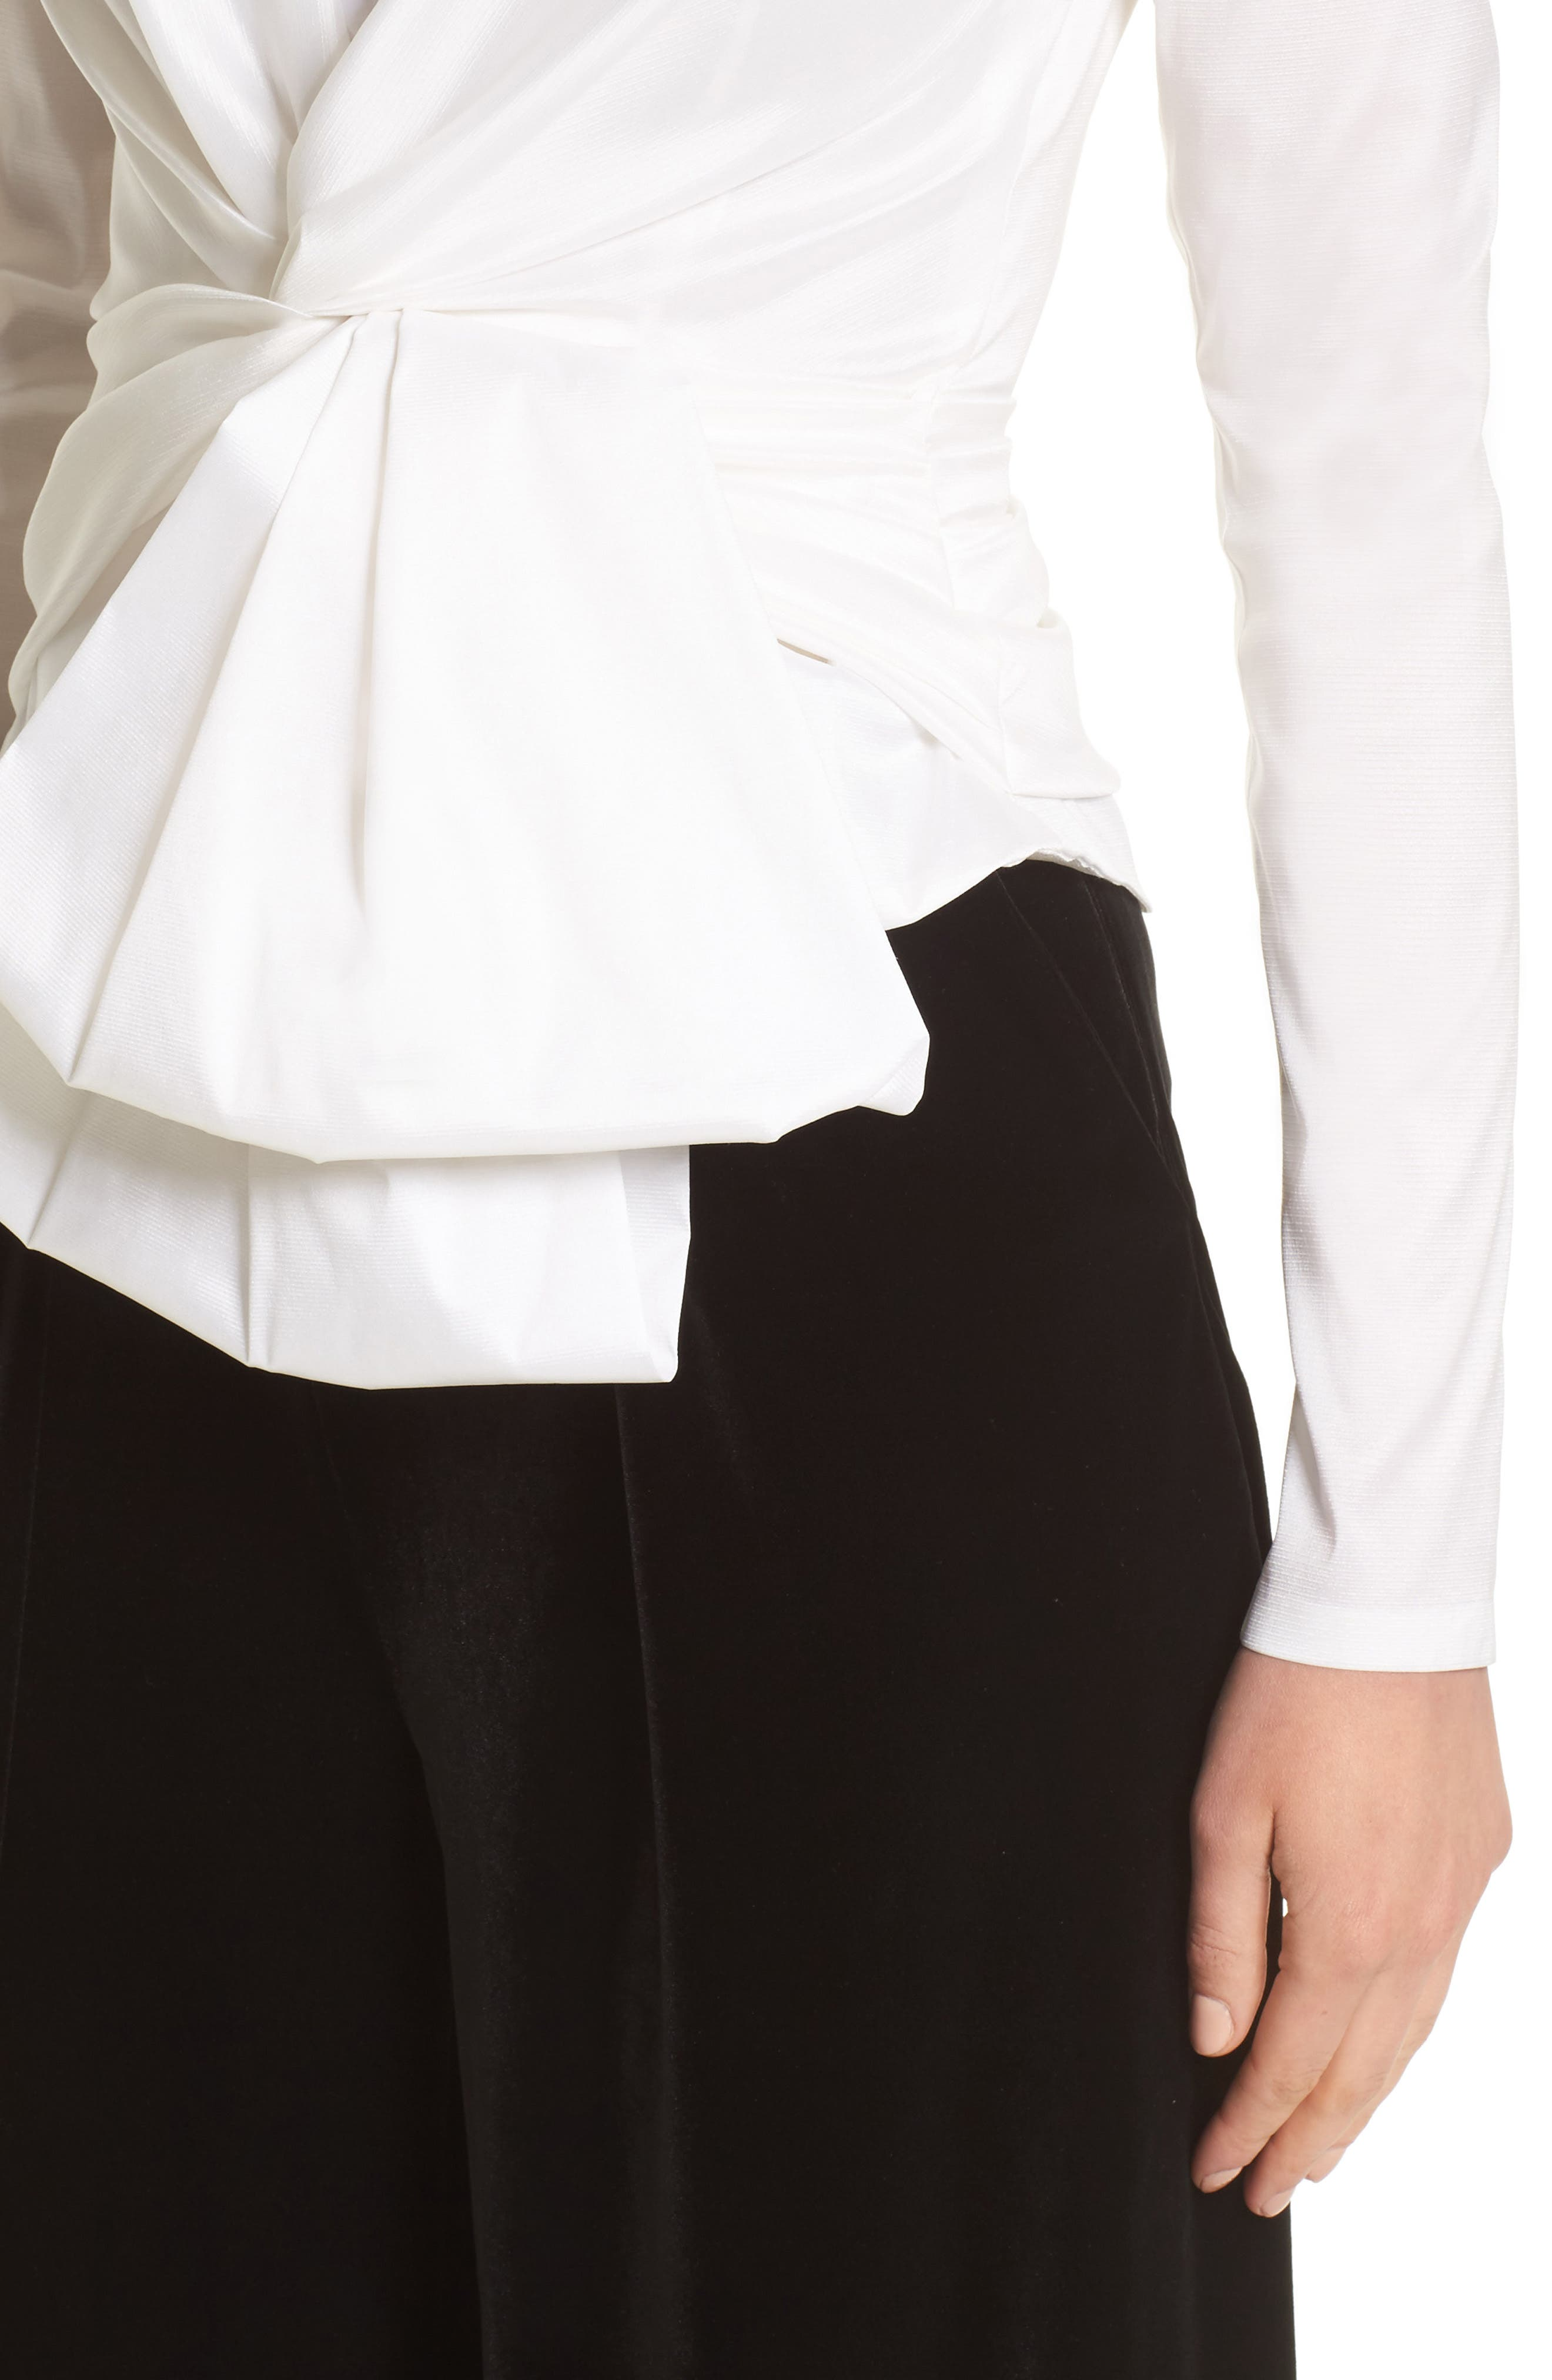 V-Neck Blouse with Bow Detail,                             Alternate thumbnail 4, color,                             White